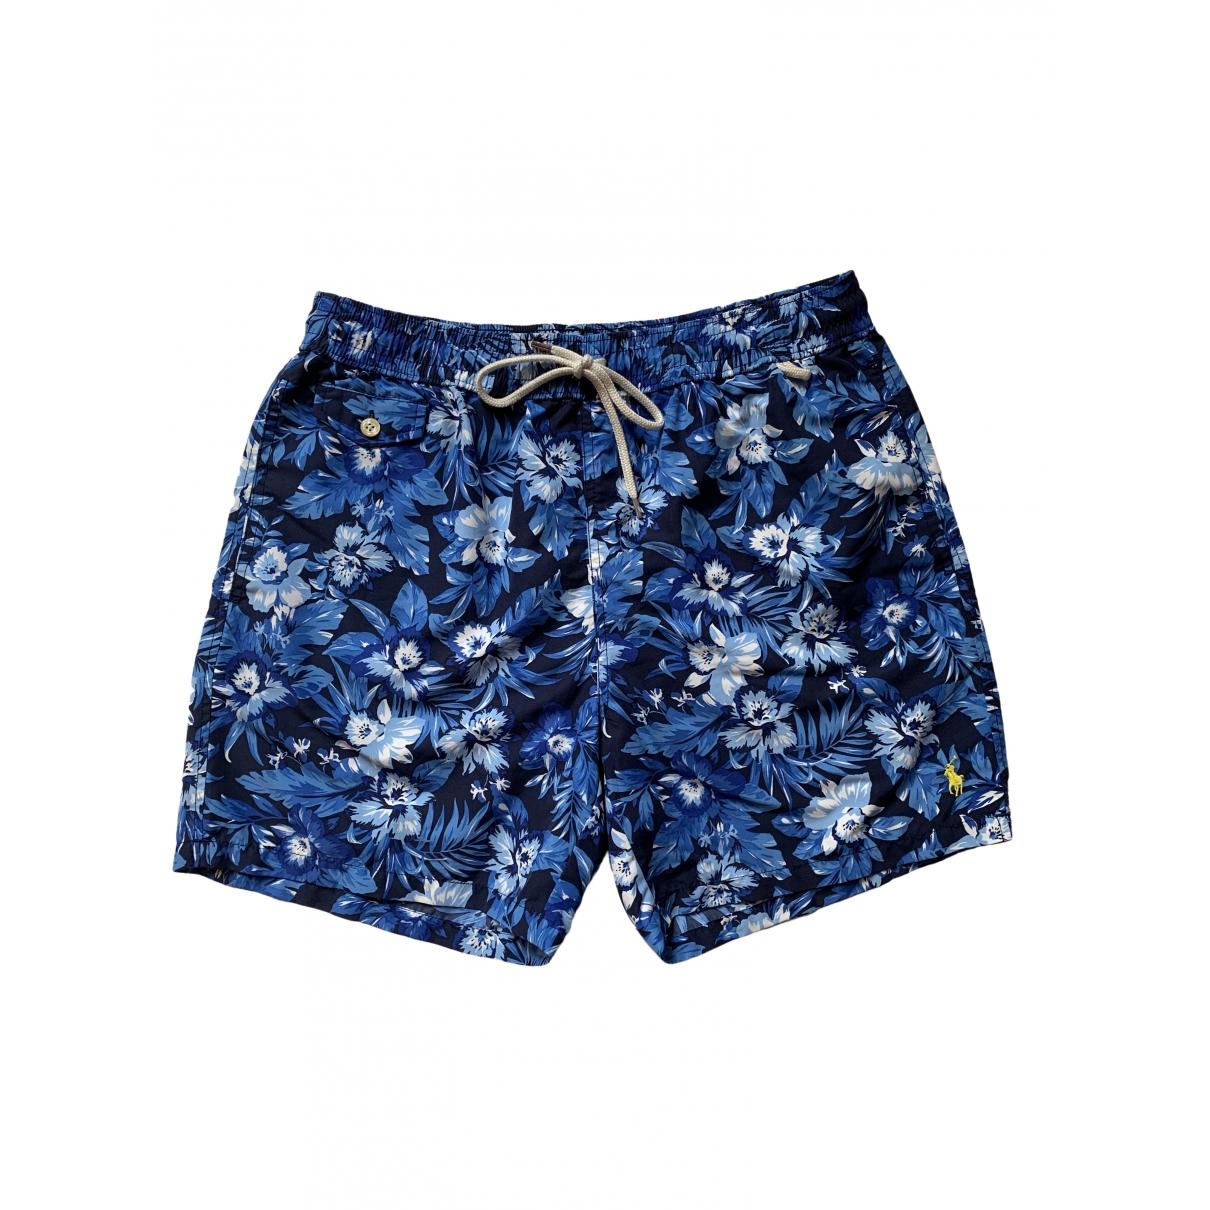 Polo Ralph Lauren \N Badeanzug in  Blau Synthetik